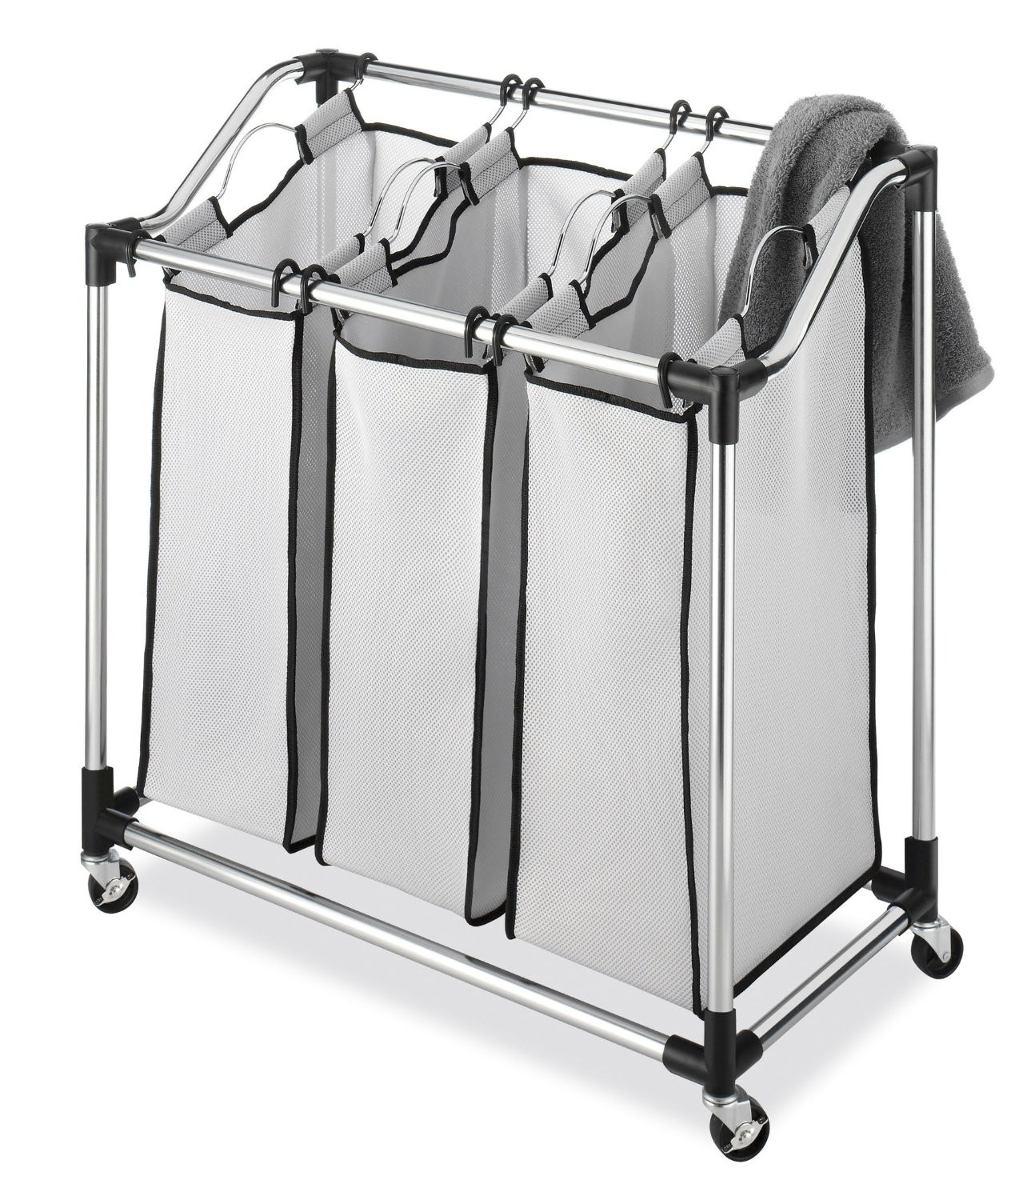 Cesto canasta para ropa sucia lavanderia 3 niveles - Cestos para ropa sucia ...